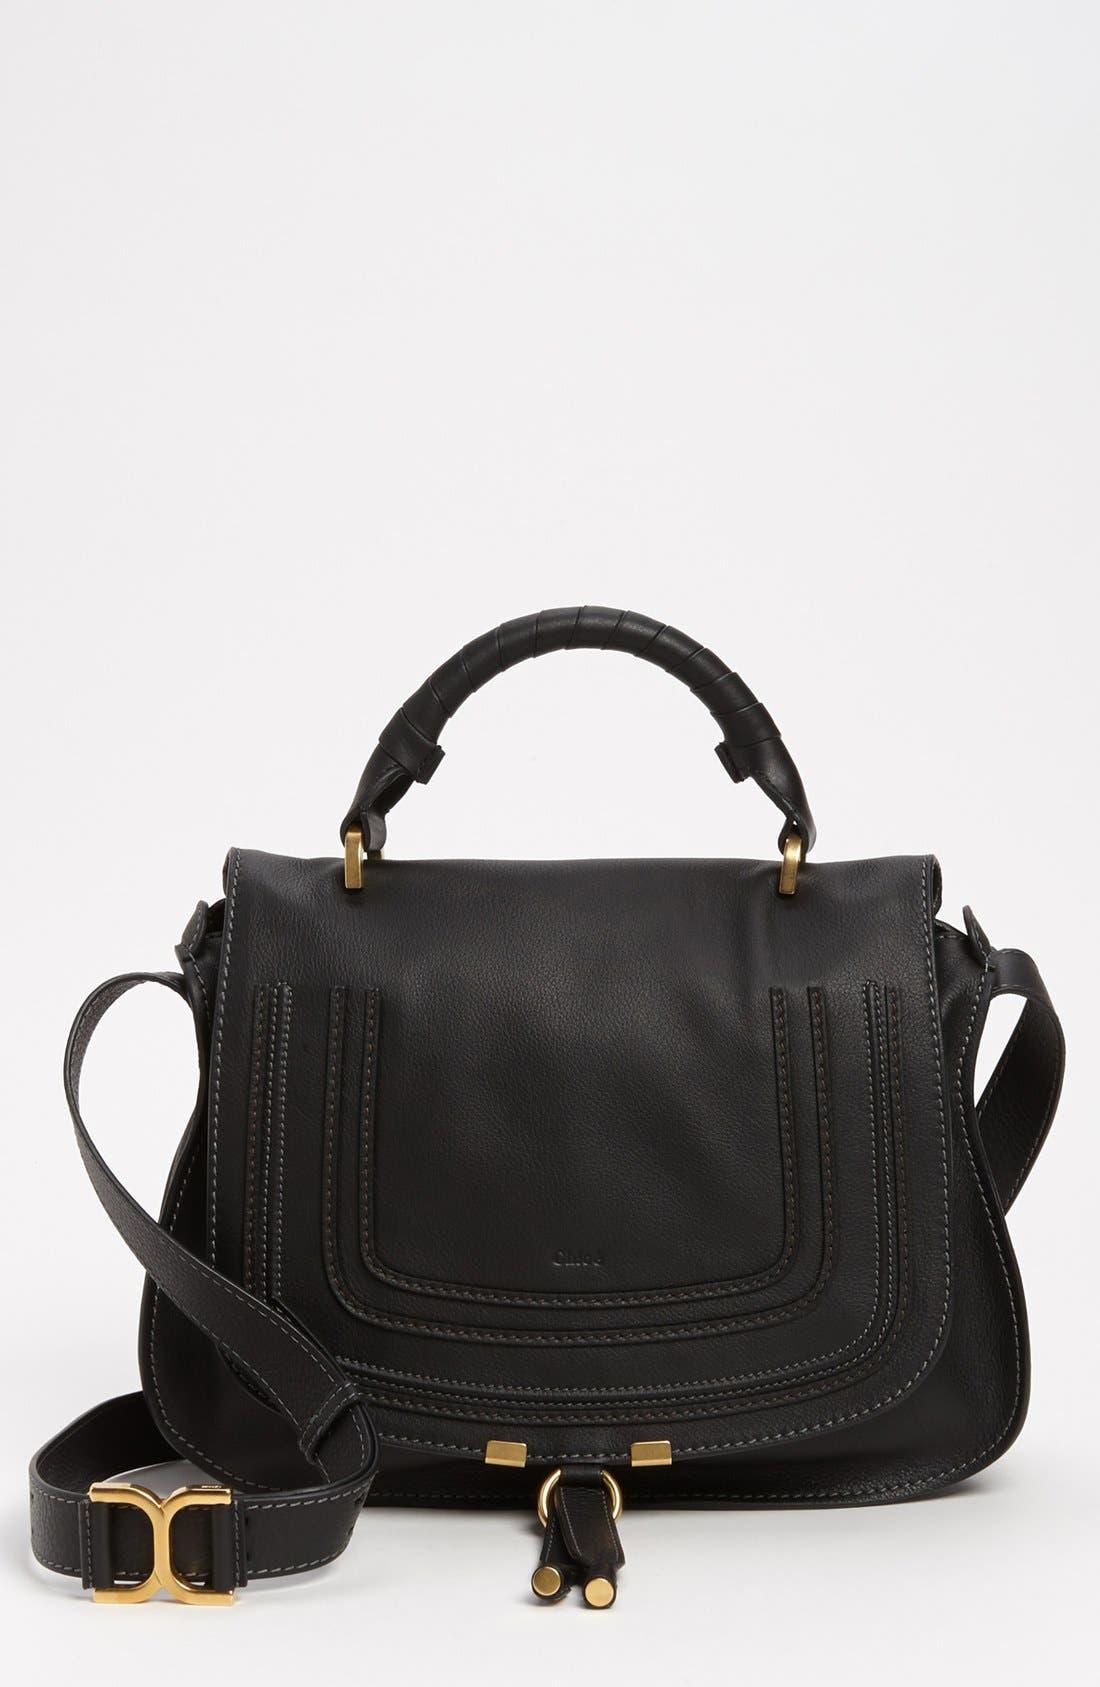 Main Image - Chloé 'Marcie' Top Handle Leather Satchel